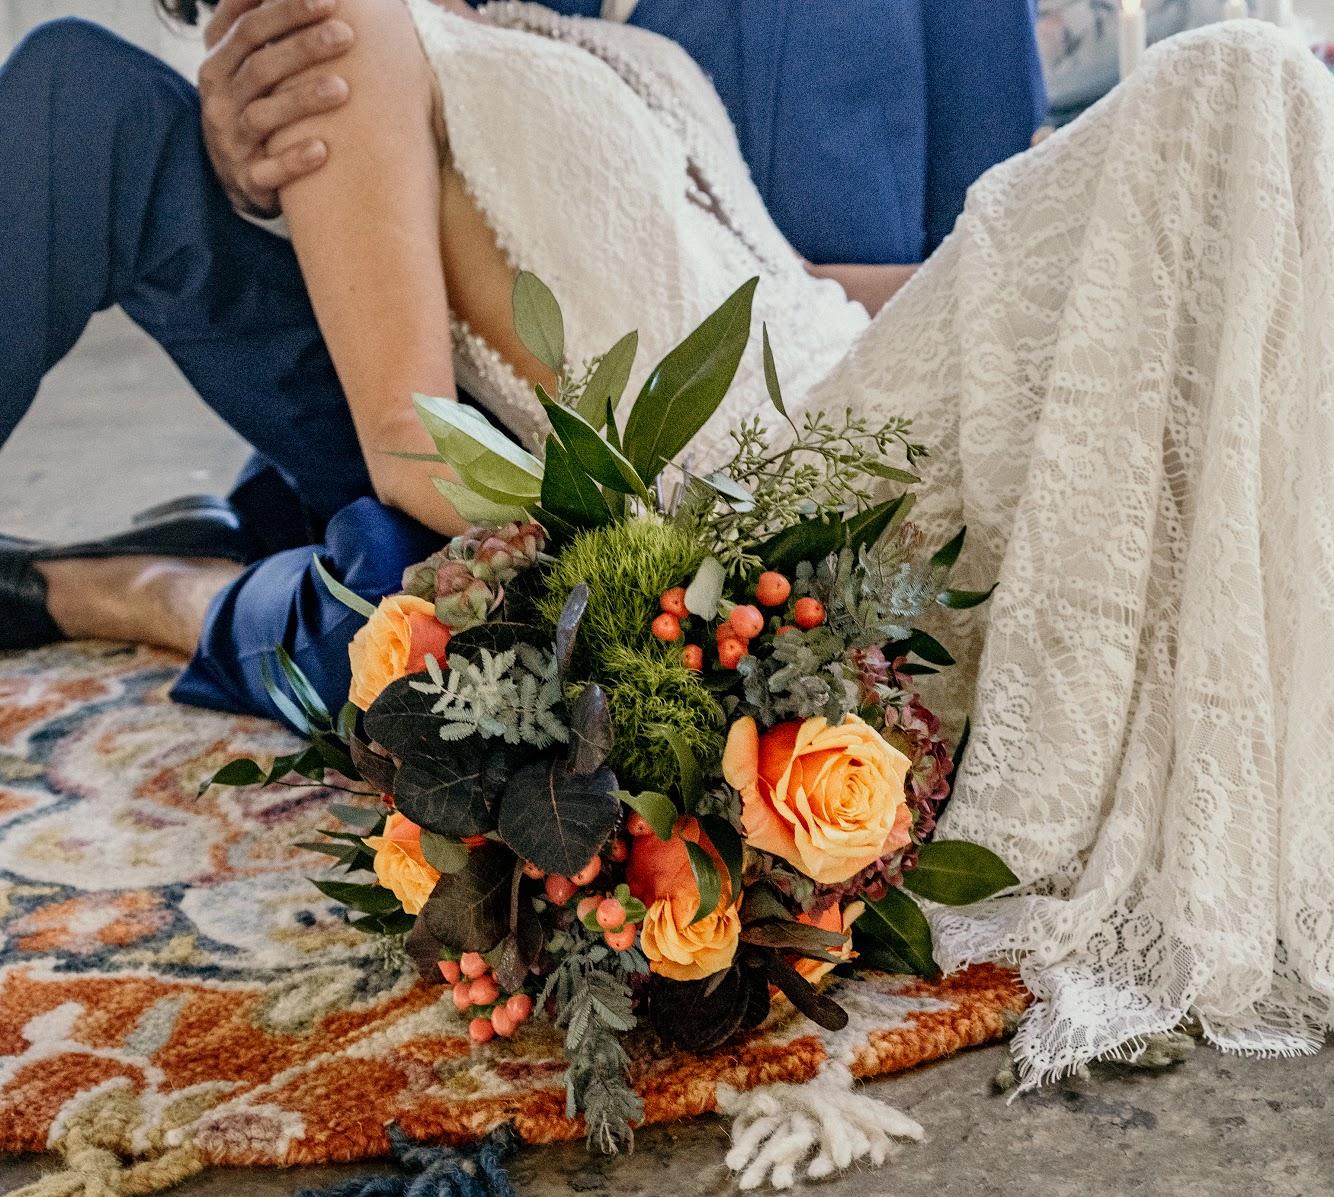 Boho_weddings_iowa_bohemian_weddings_desmoines_wedding_florist